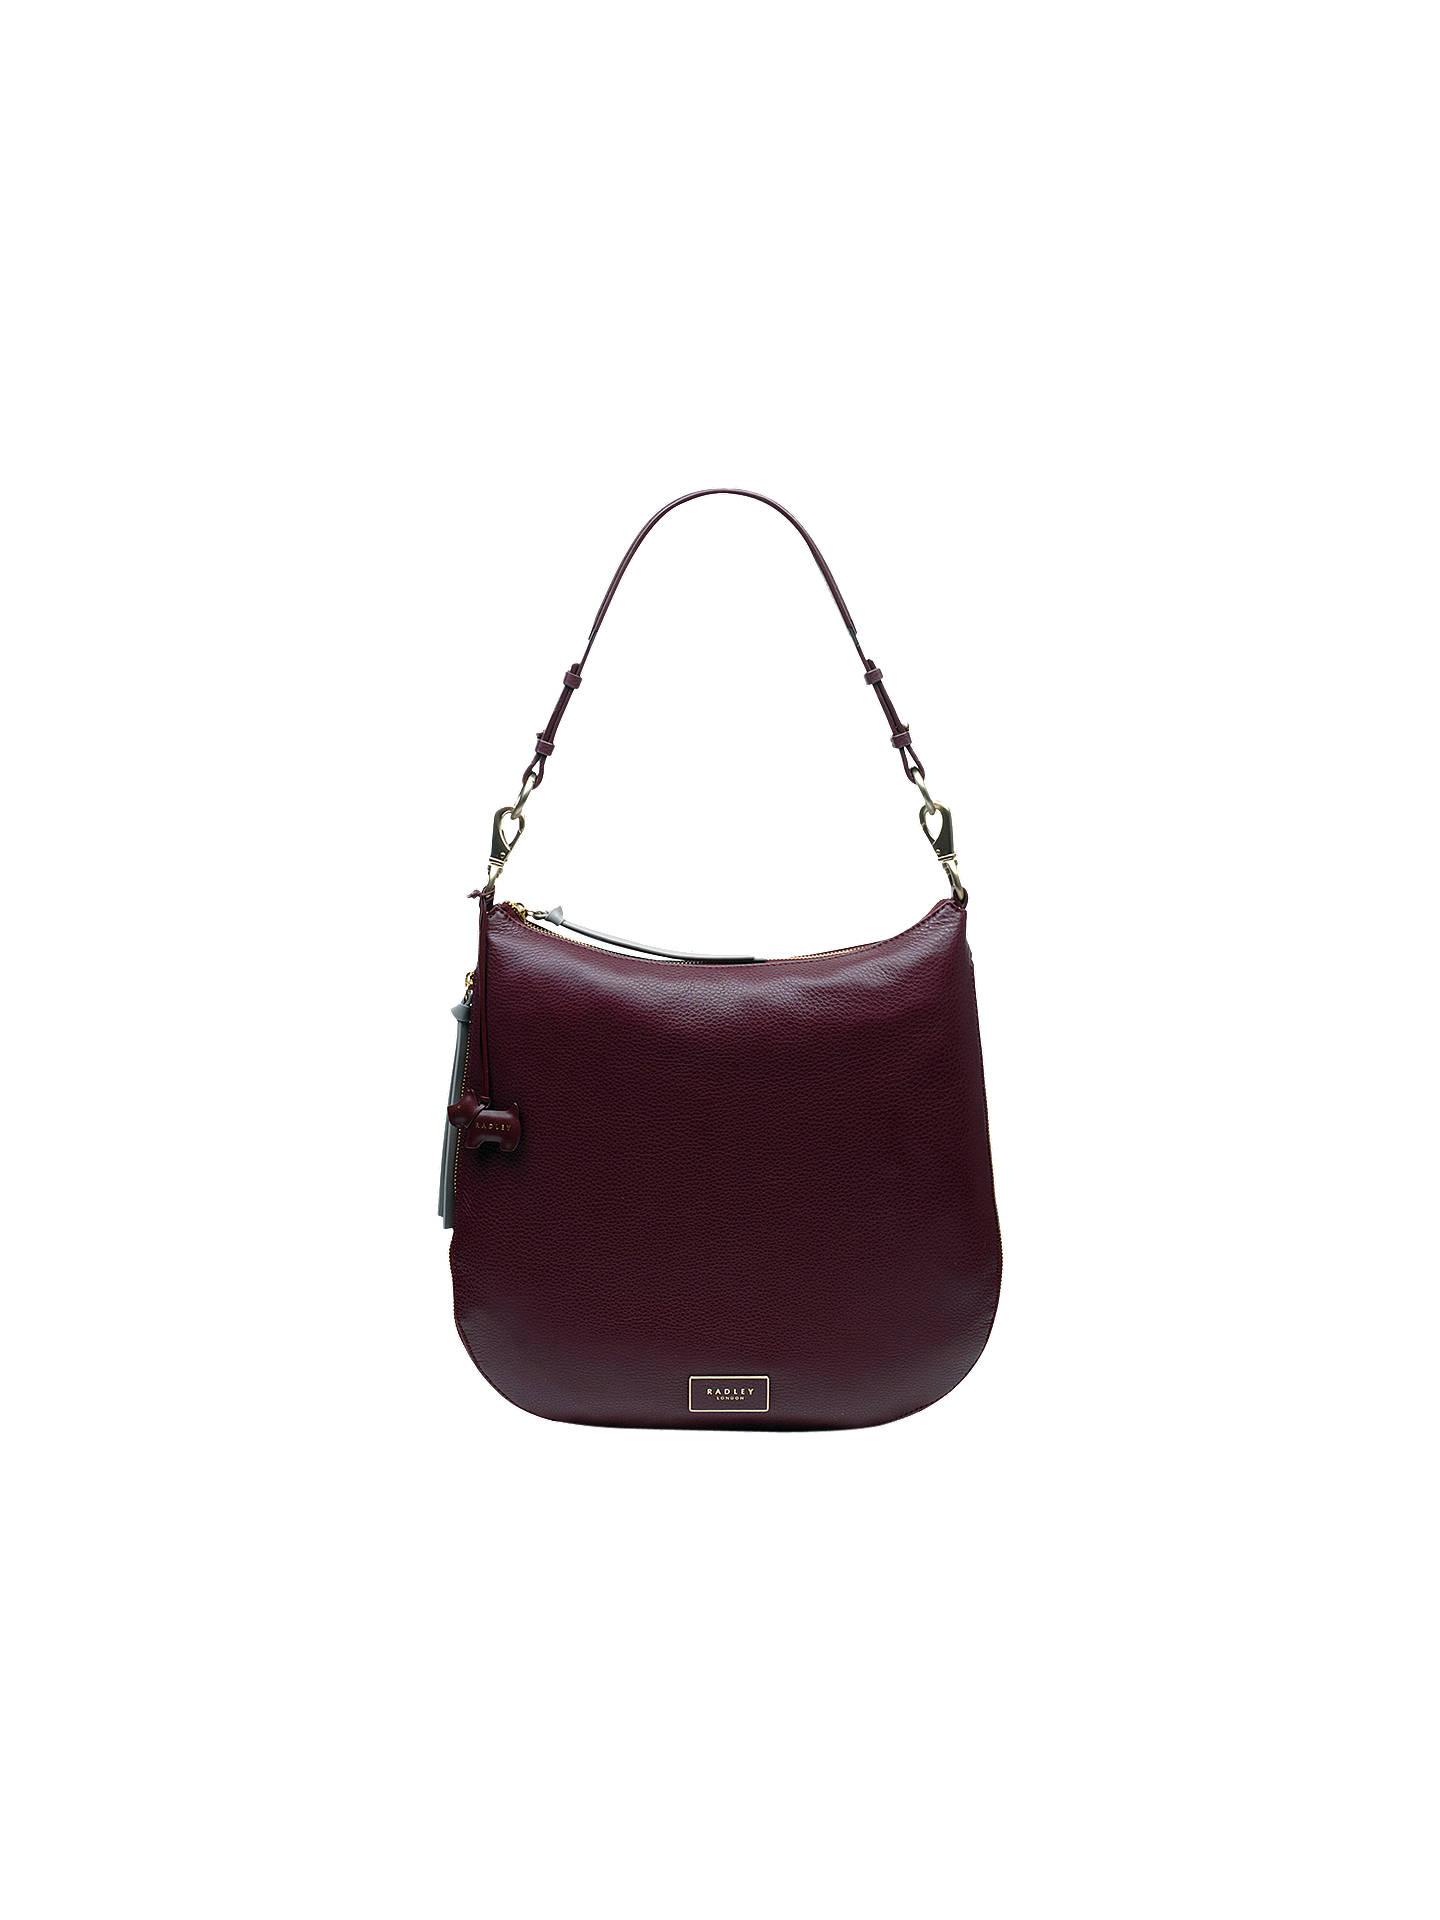 bee13c06b442 BuyRadley Pudding Lane Leather Large Hobo Bag